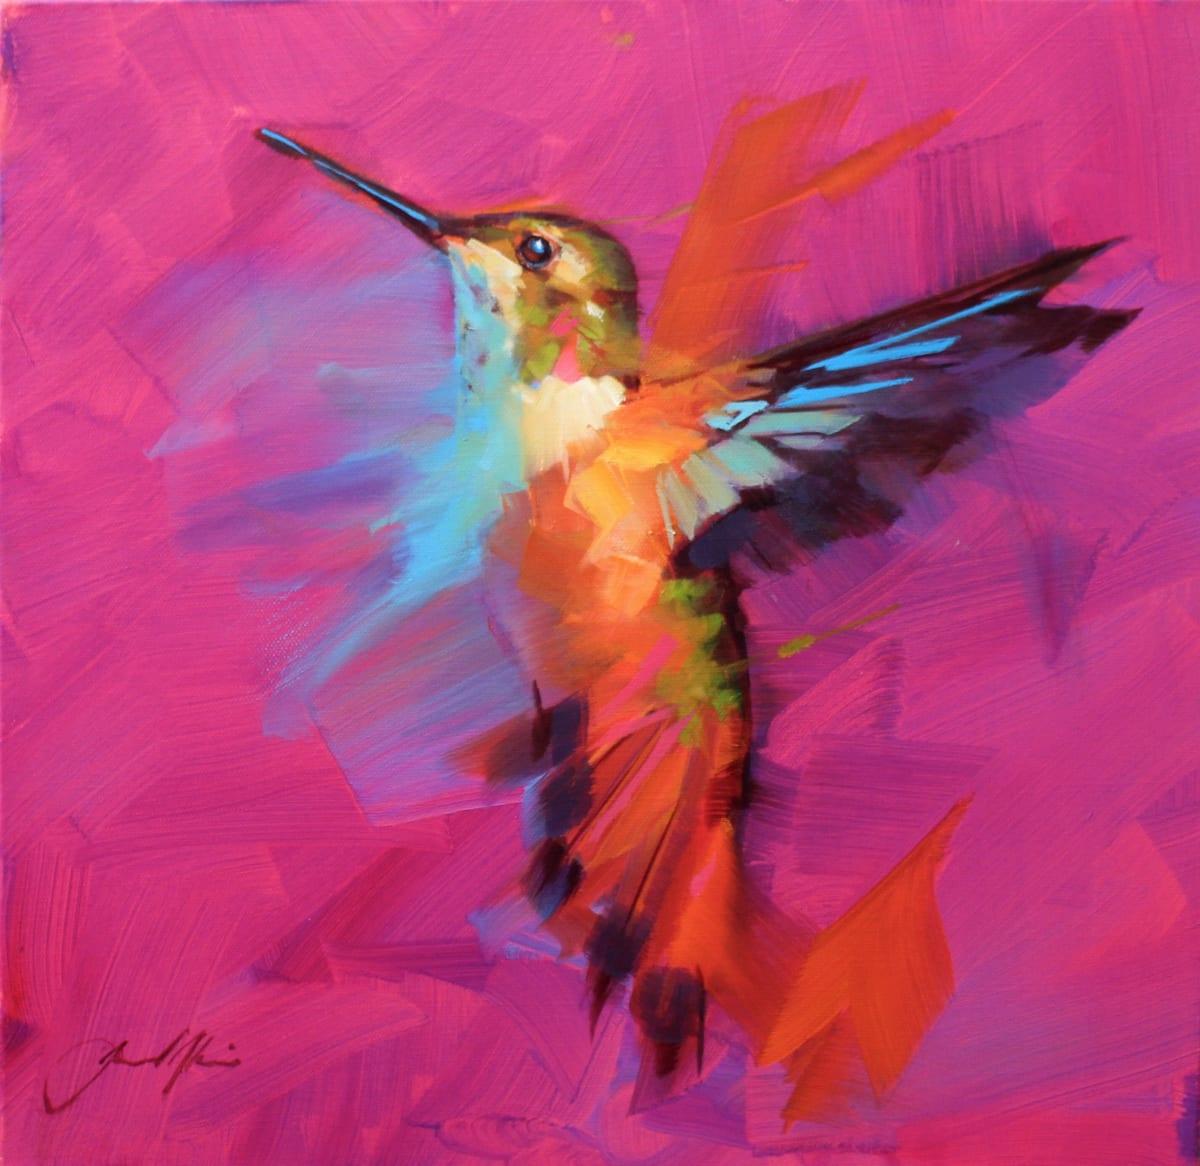 Jamel Akib Electric Hummingbird , 2019 Oil on Canvas 40 x 40 x 4 cm 15 3/4 x 15 3/4 x 1 5/8 in